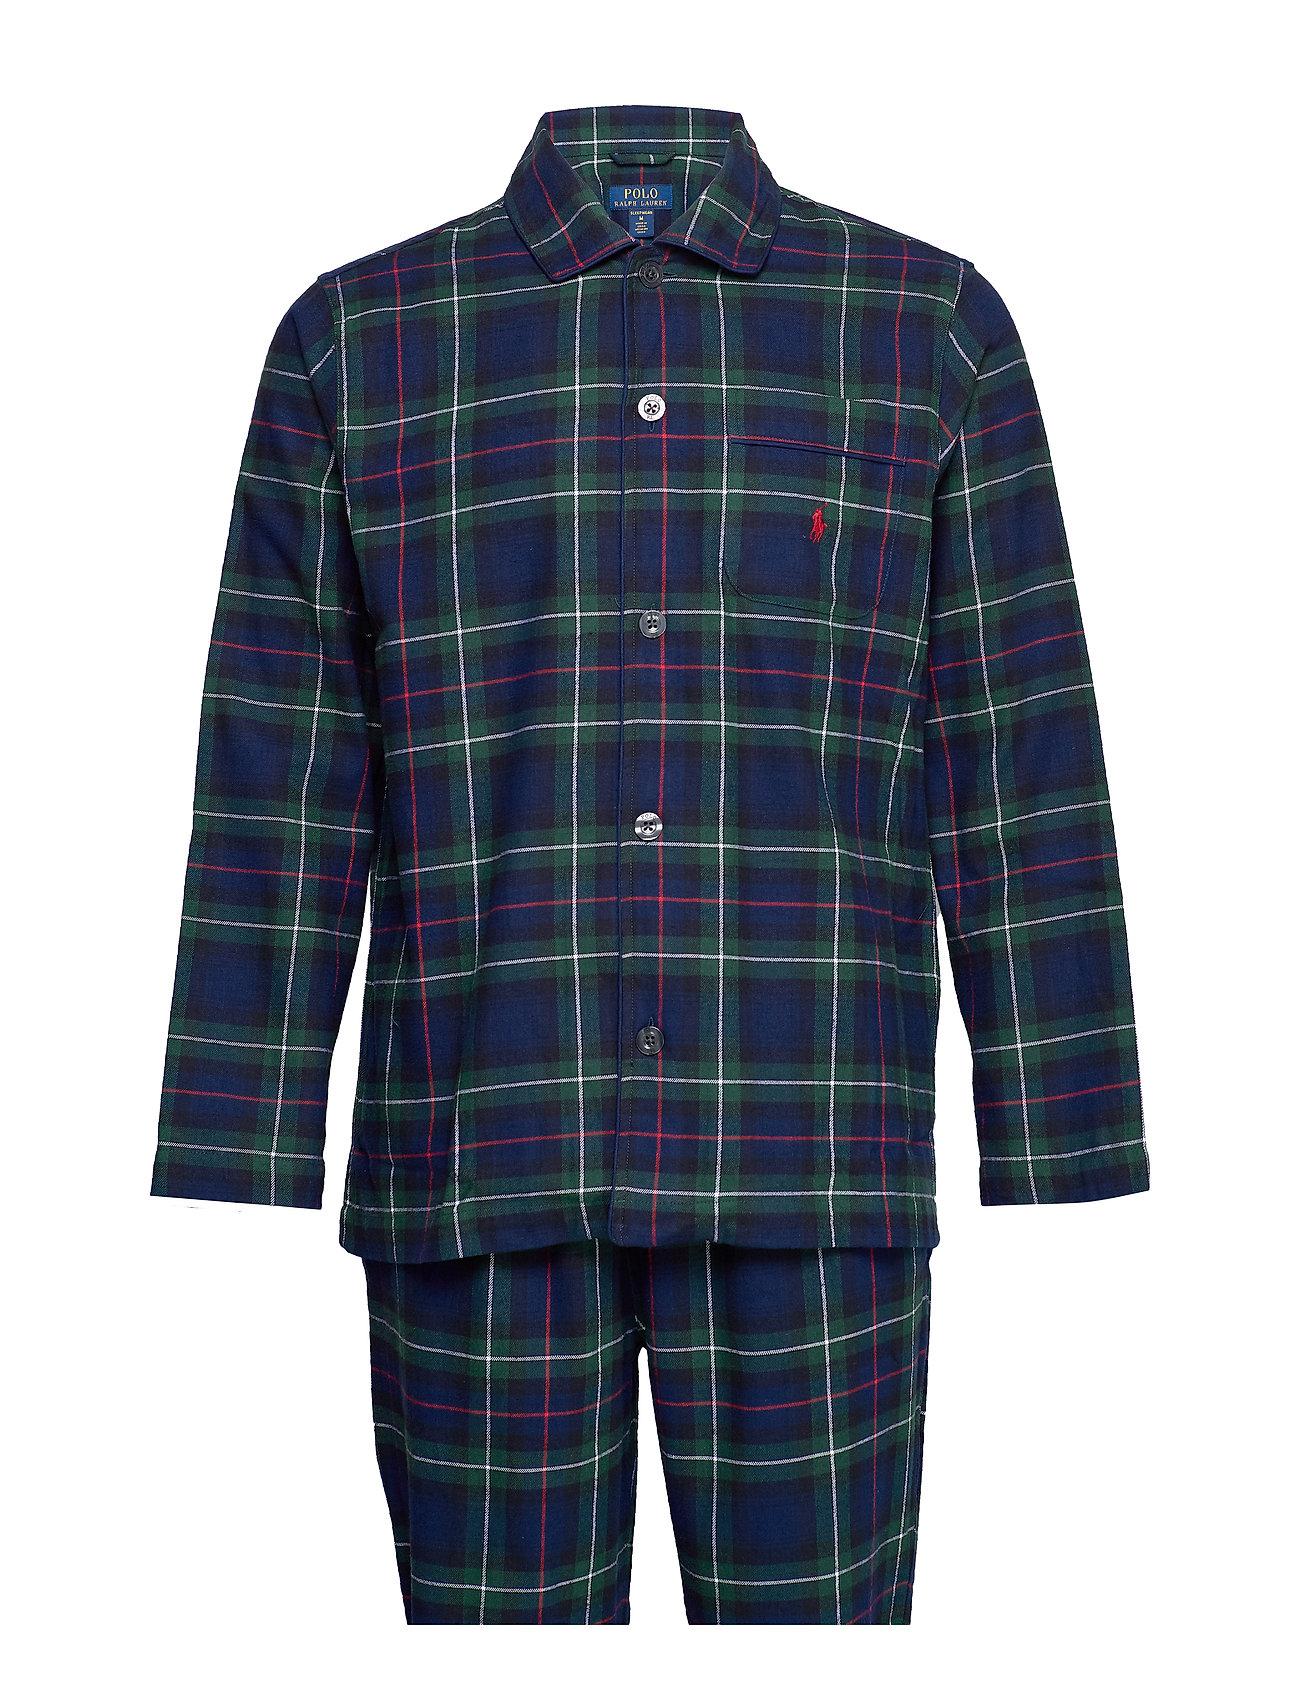 Polo Ralph Lauren Underwear L/S PJ SET-SLEEP SET - KESINGTON PLAID